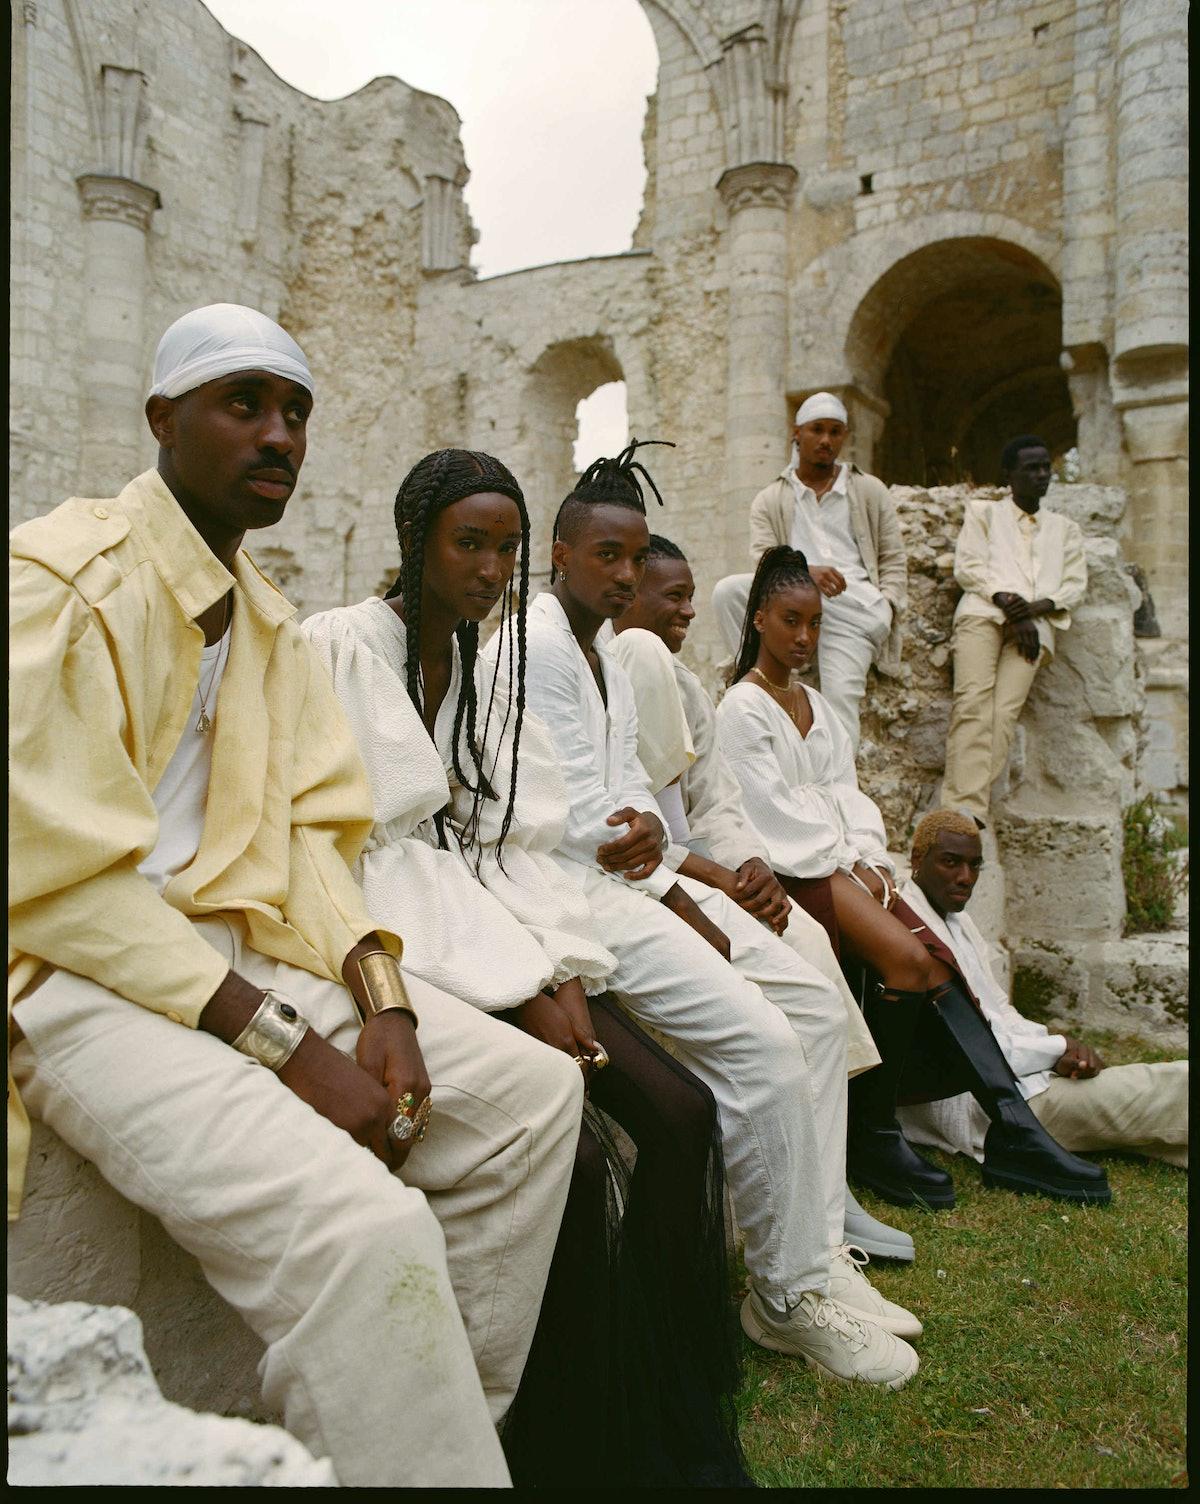 LOUS AND THE YAKUZA – AMIGO 1 – Credit Manuel Obadia Wills